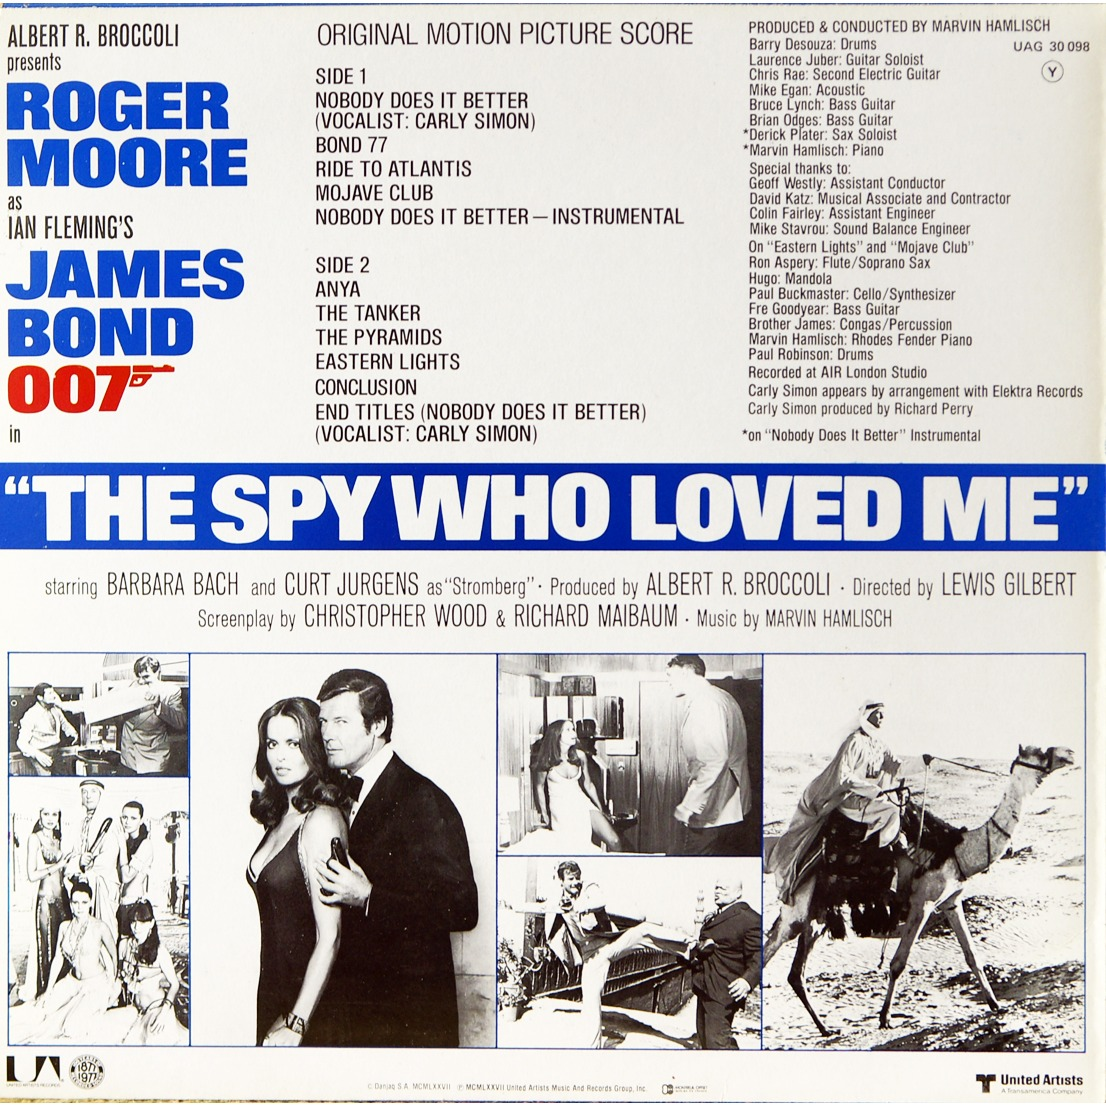 The spy who loved me - l'espion qui m'aimait - james bond ...The Spy Who Loved Me Soundtrack Carly Simon